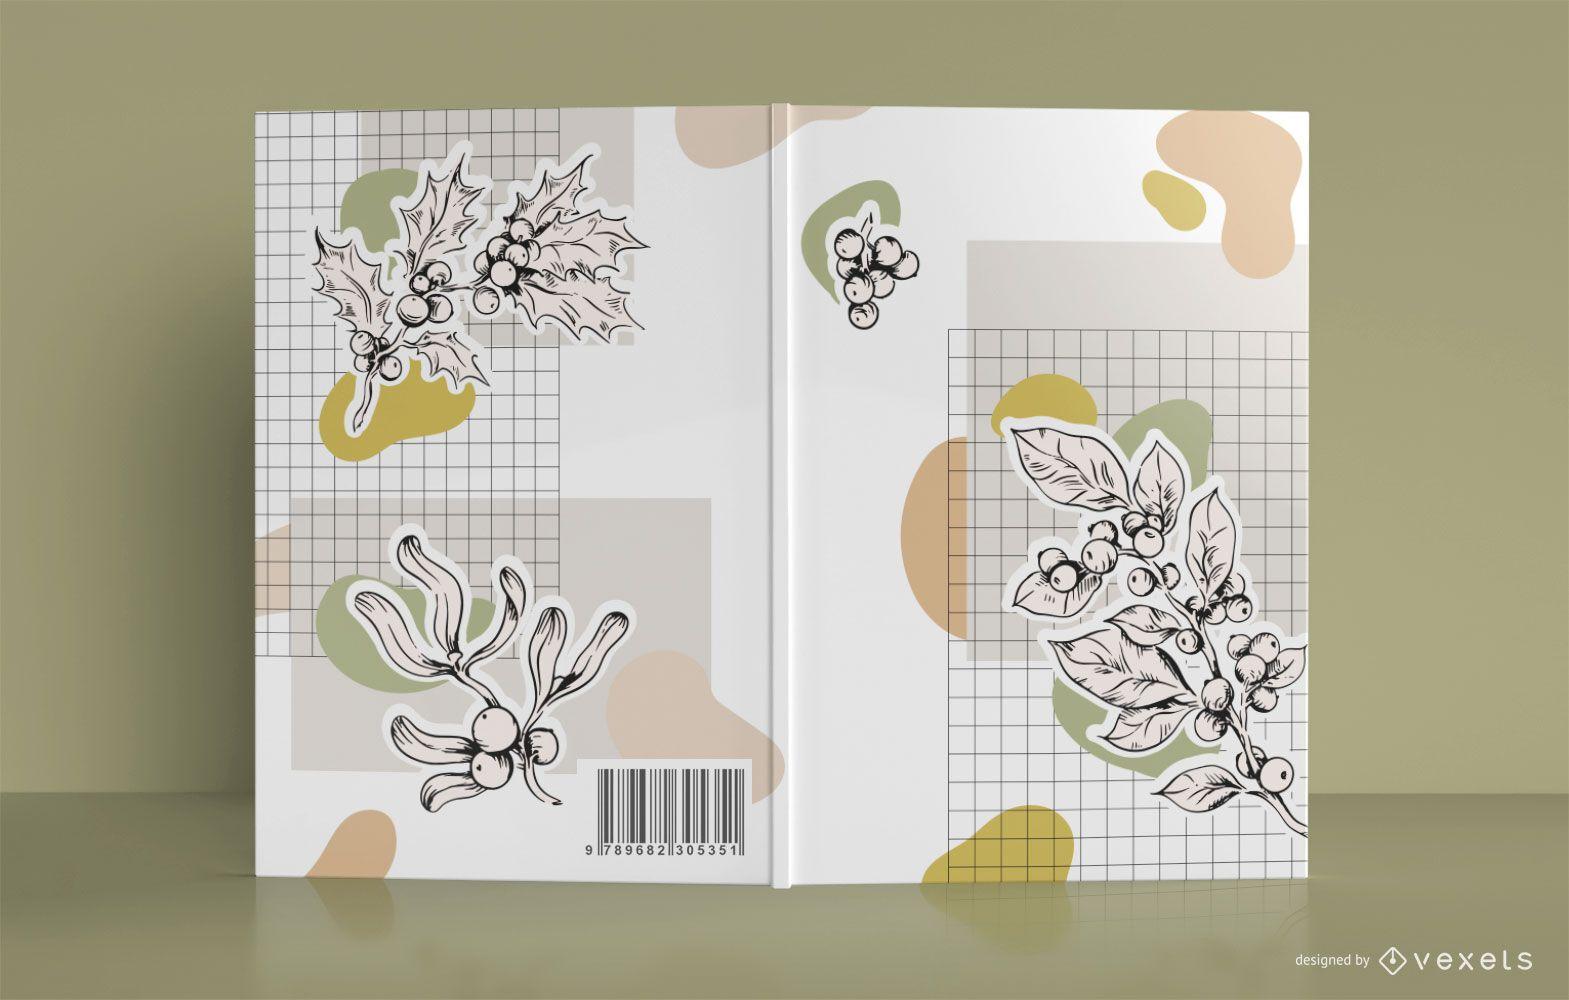 Botanical book cover design